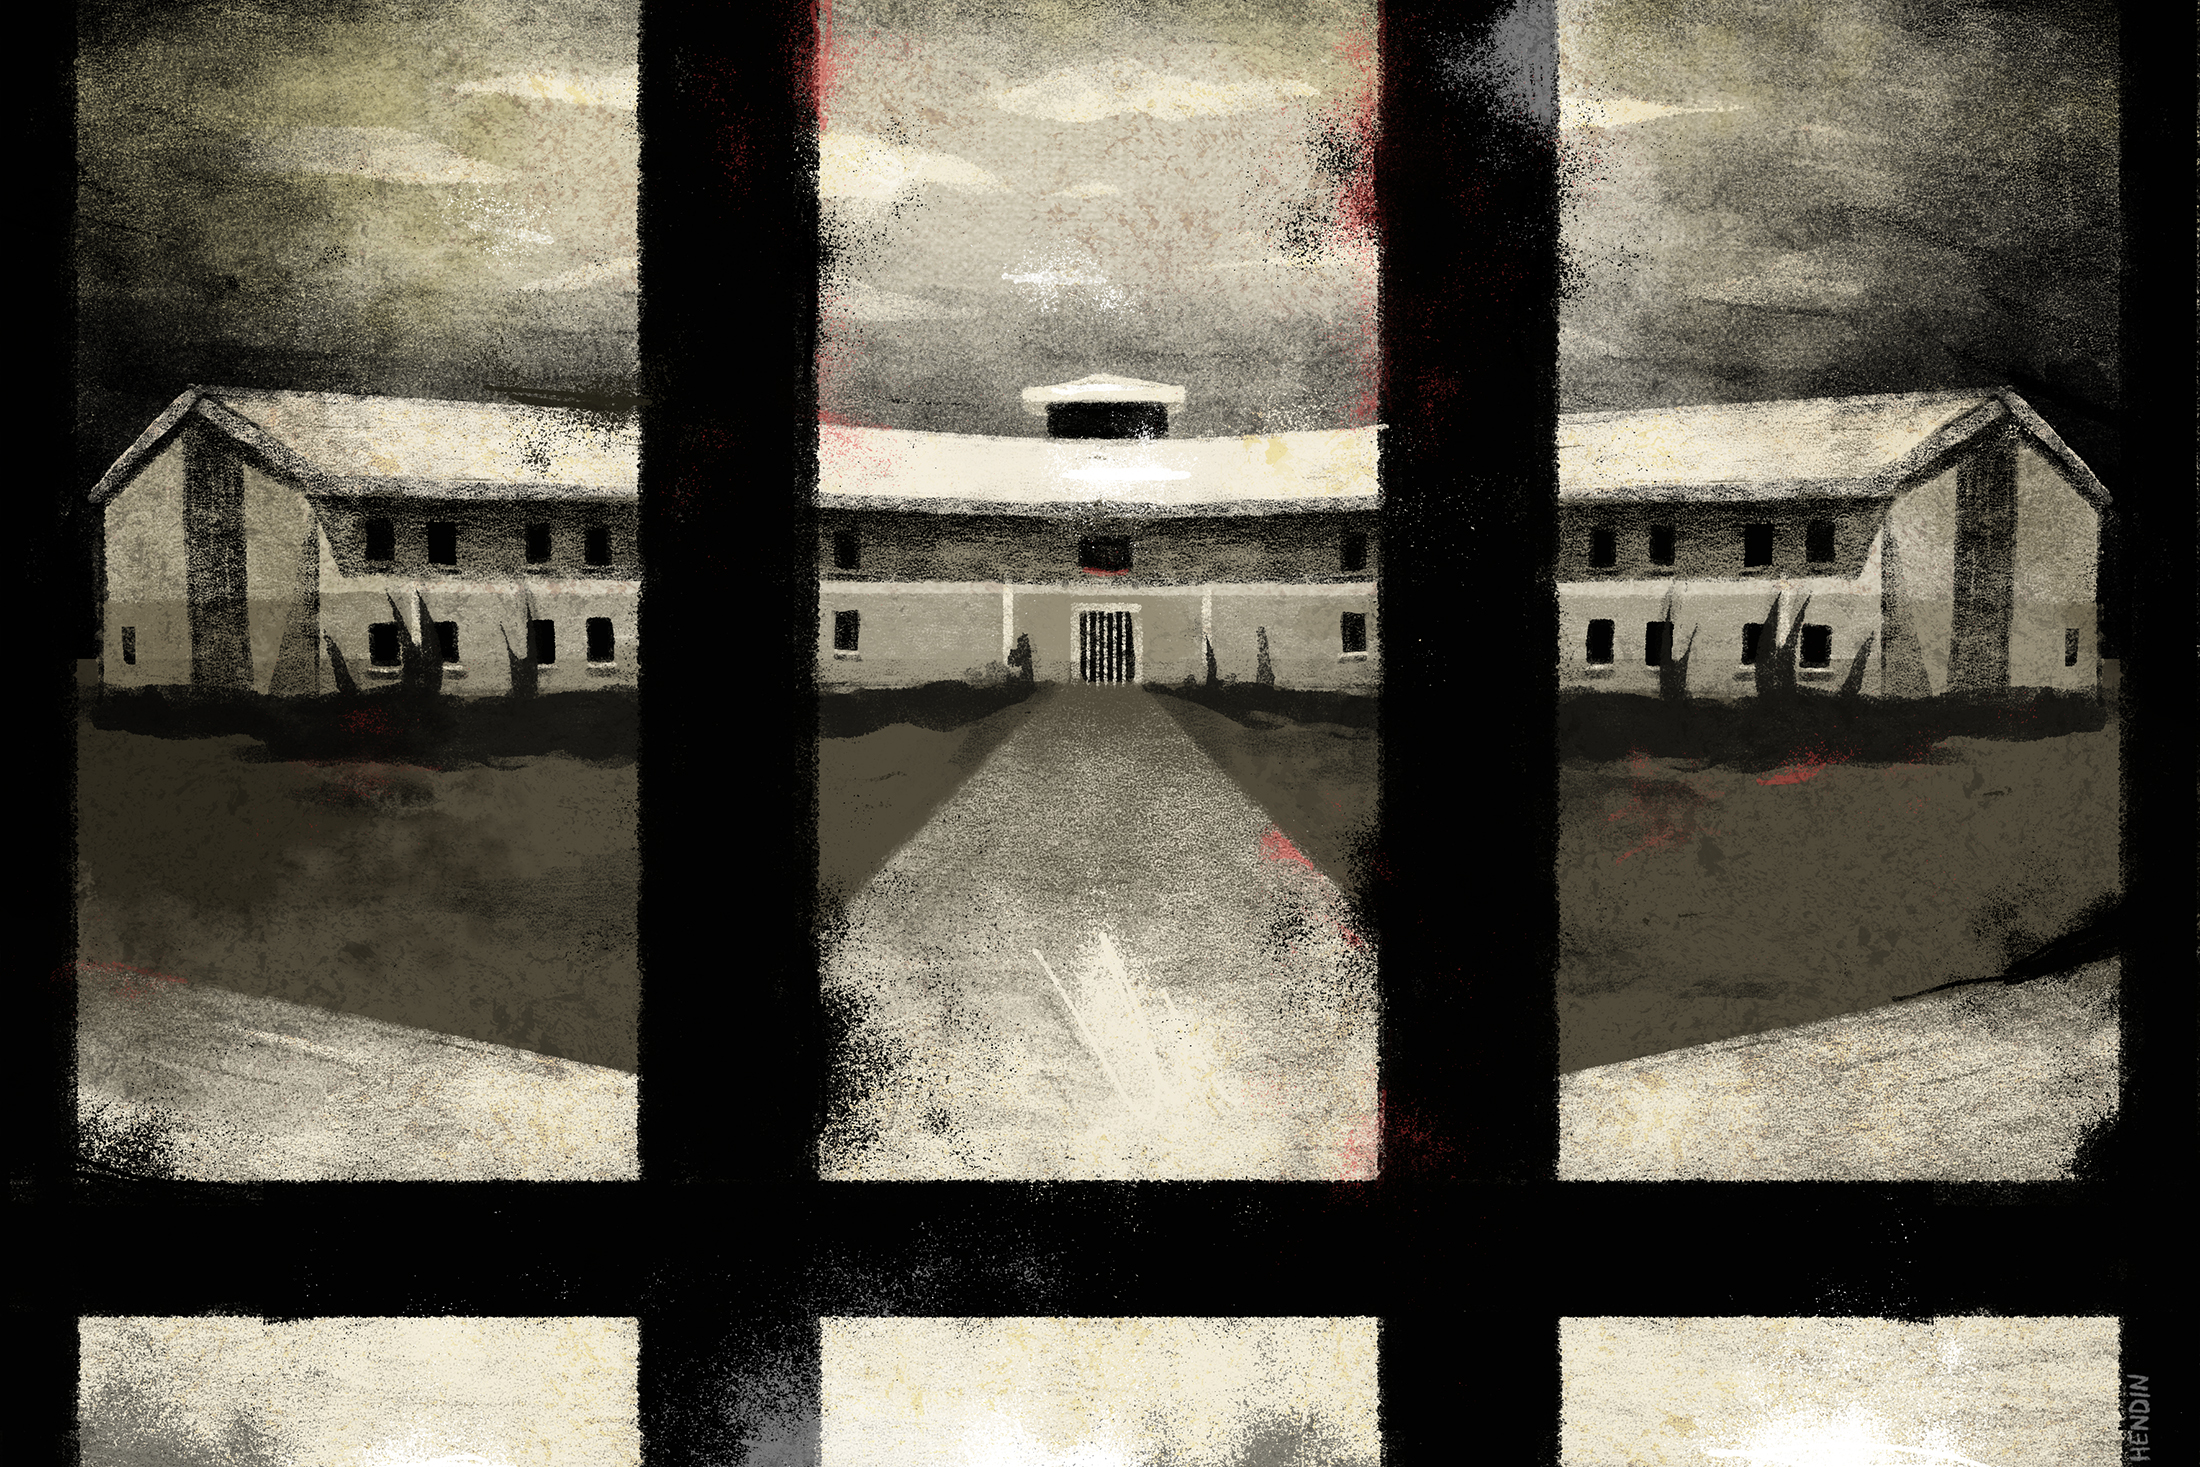 rebecca-hendin-emily-dugan-women-prisoners-strip-search-buzzfeed-uk-illustration-3